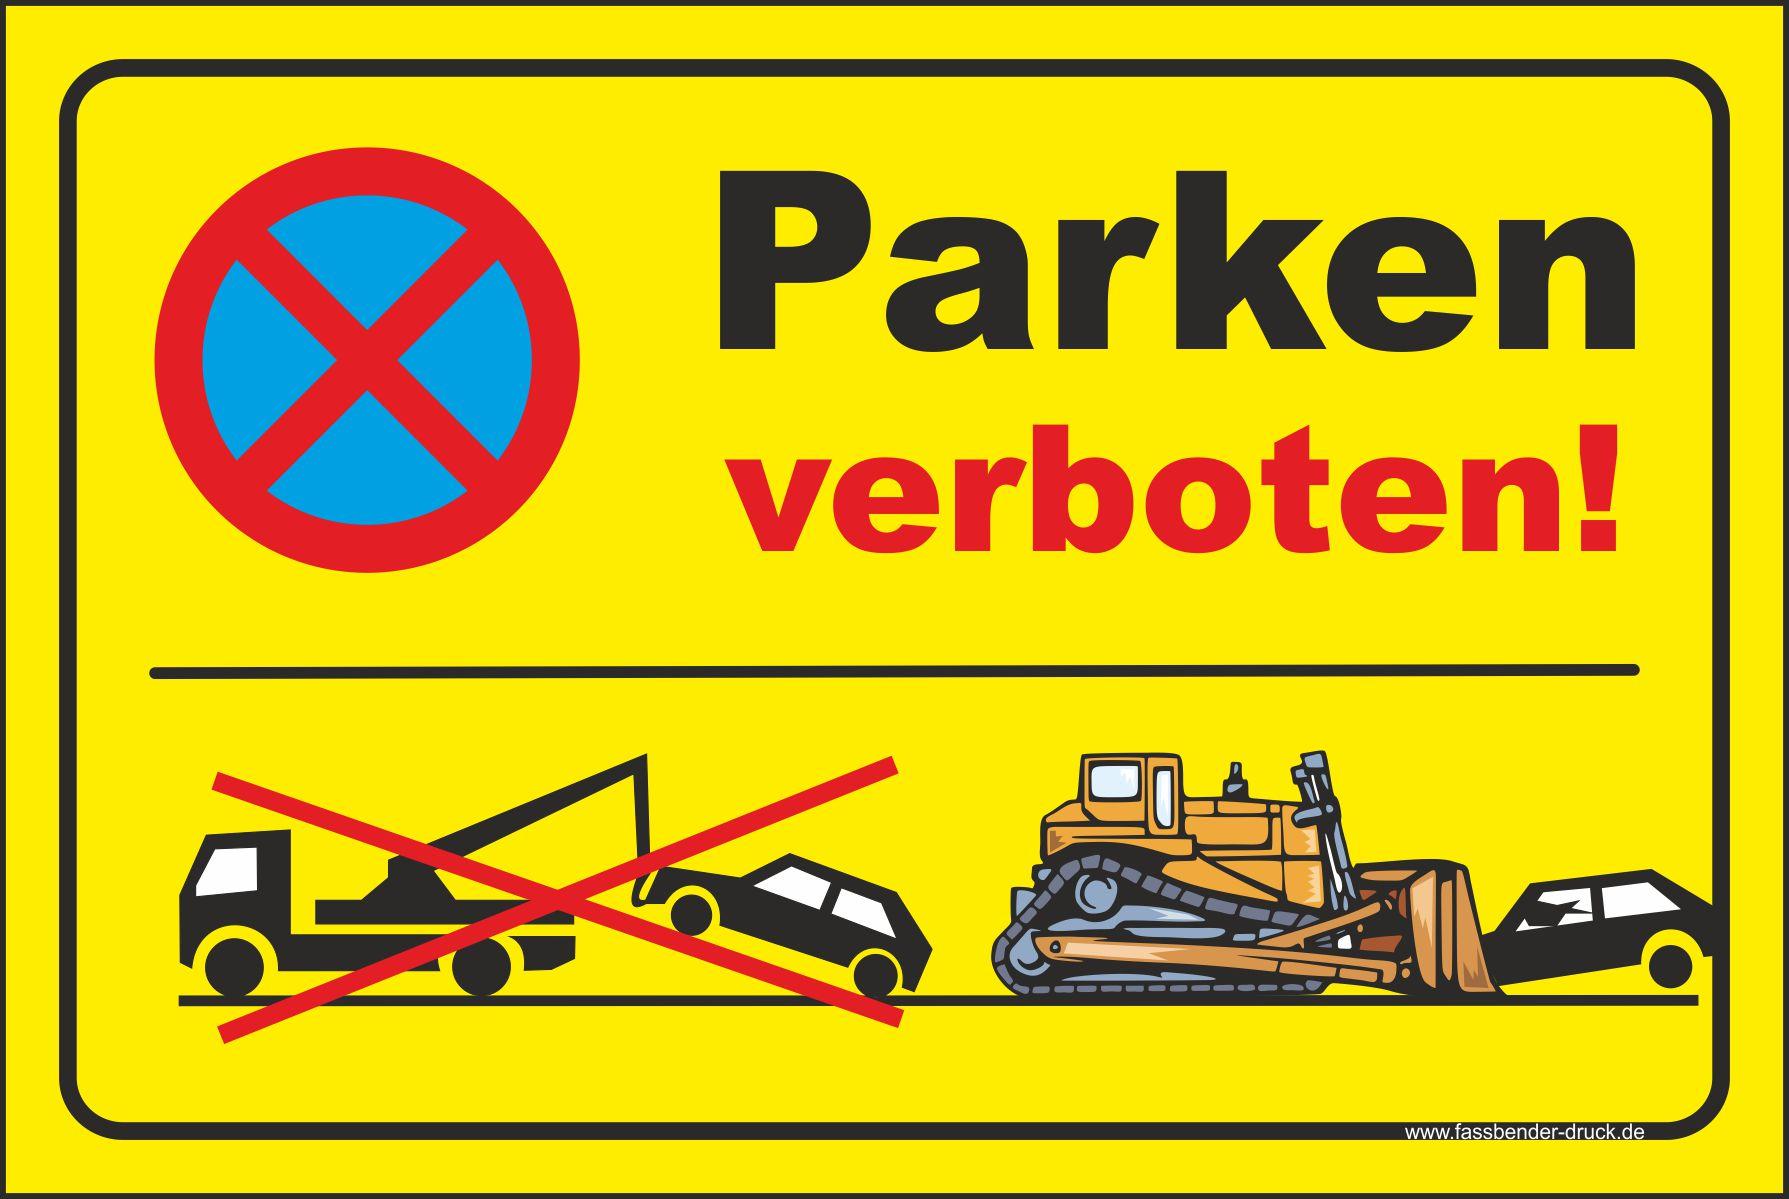 20x30cm parkverbot schild aufkleber parken verboten wir. Black Bedroom Furniture Sets. Home Design Ideas